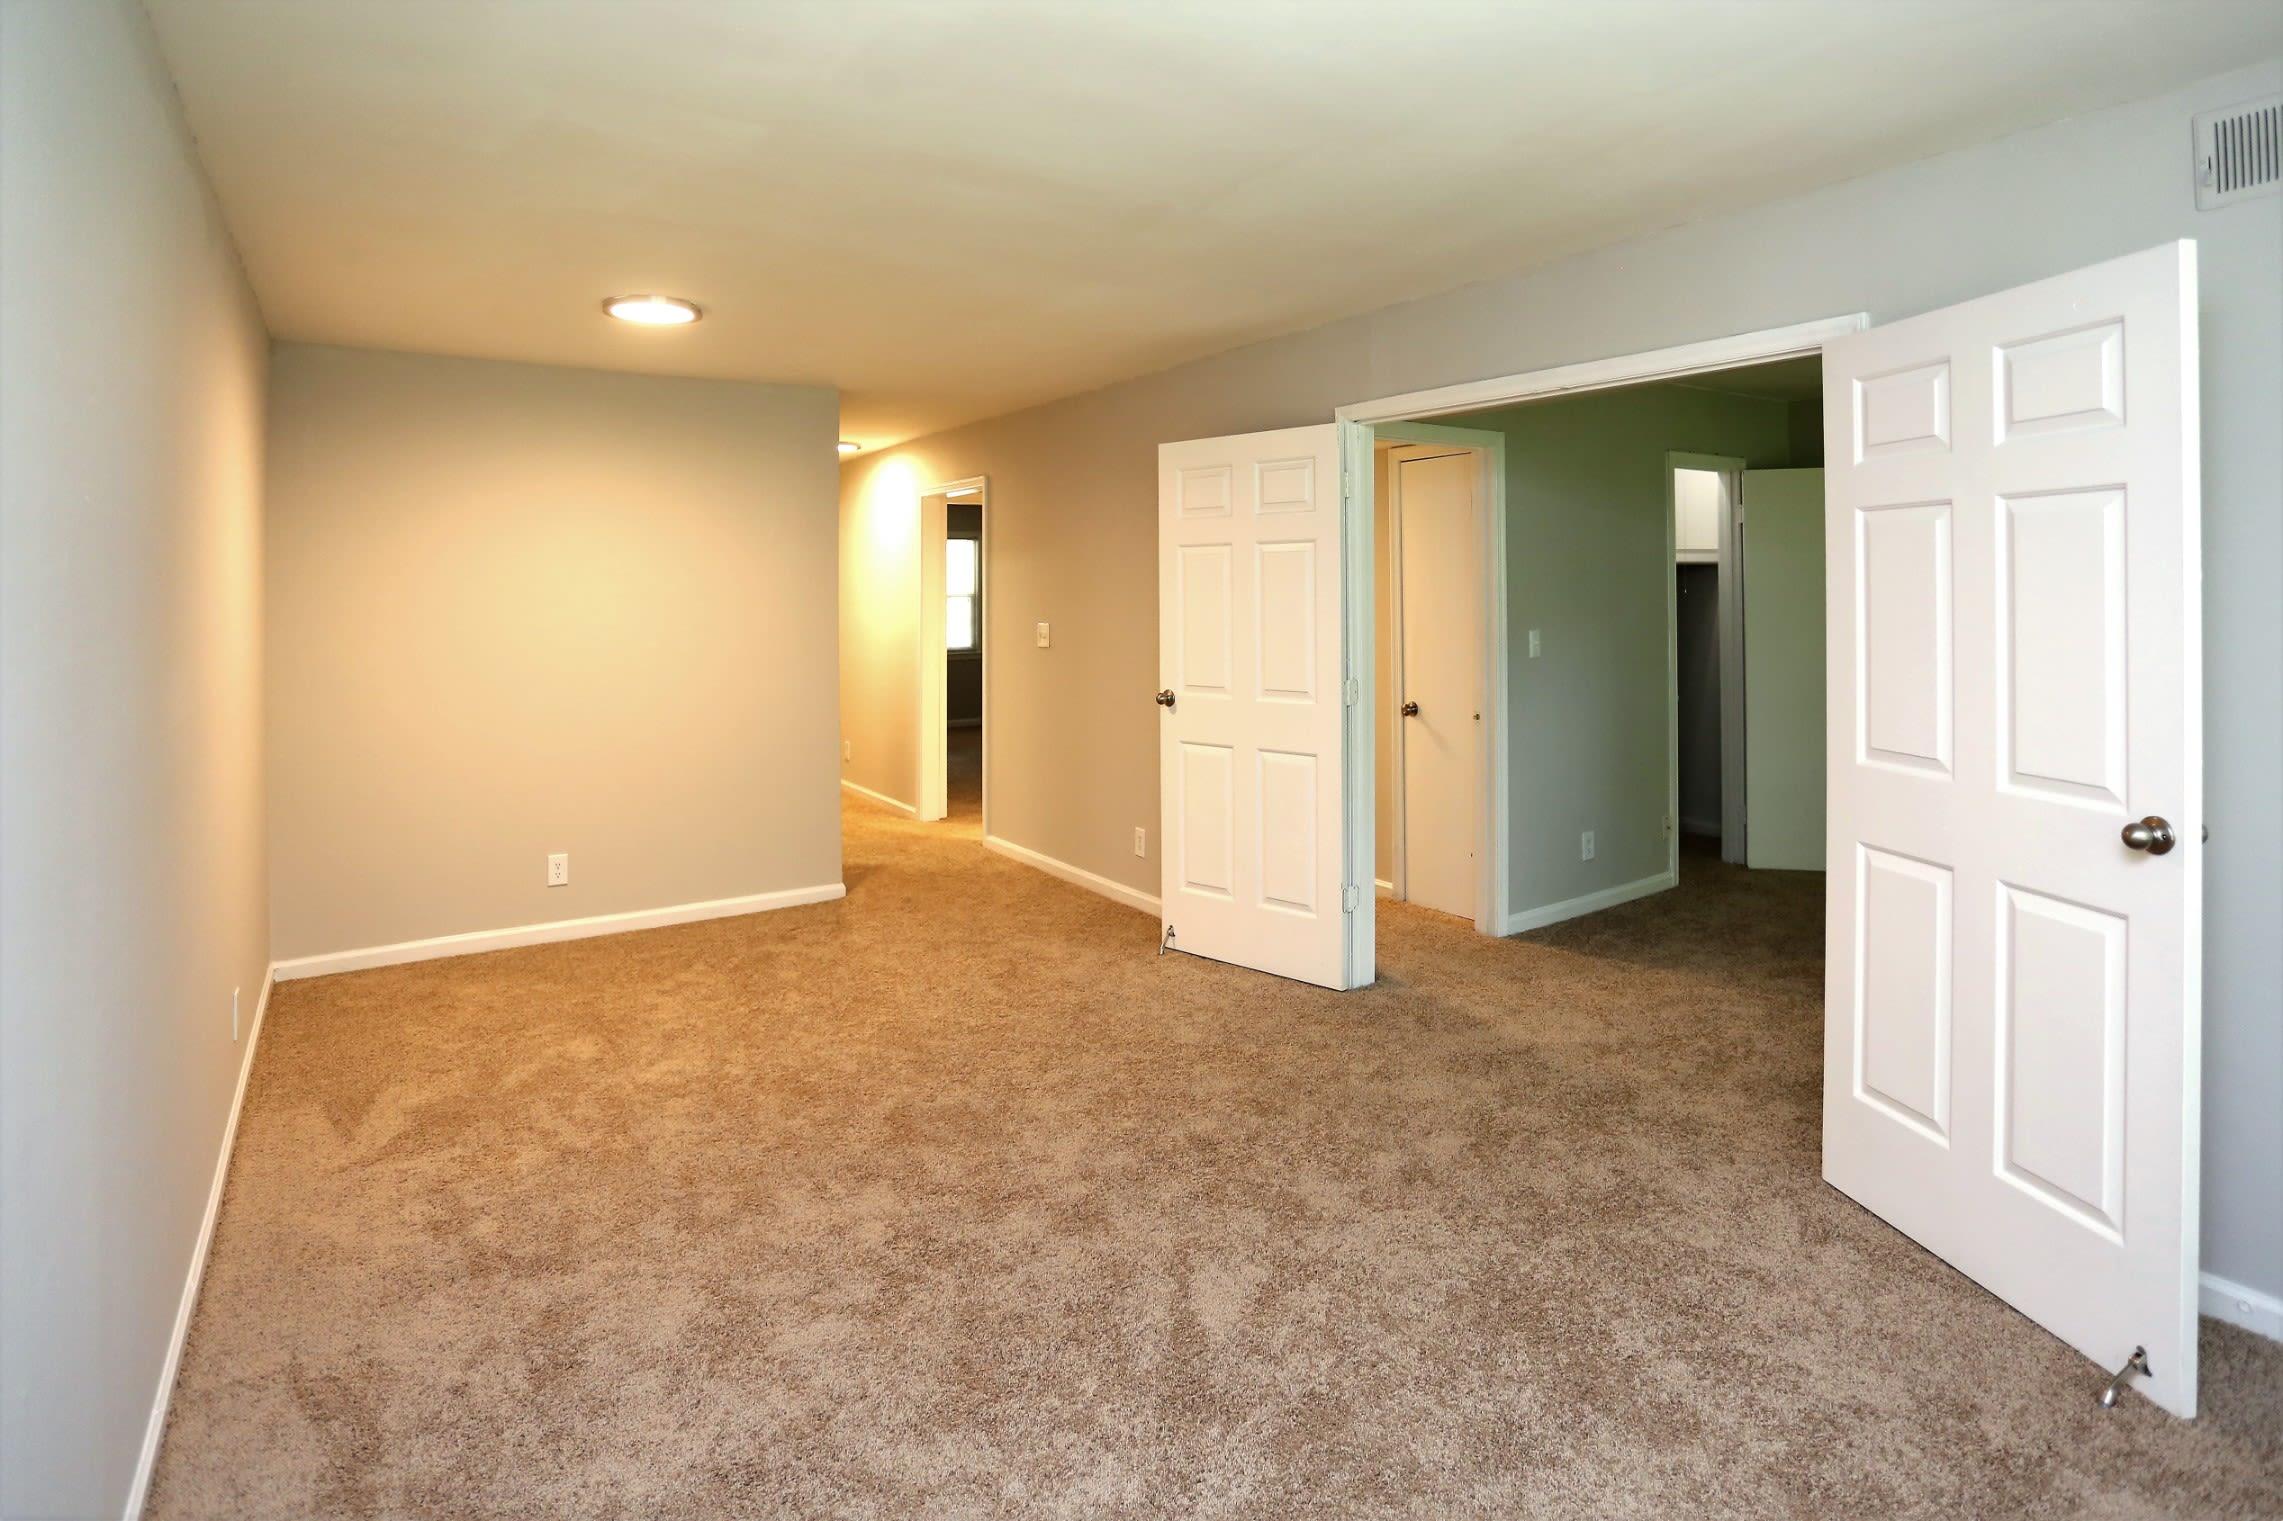 Spacious Carpeted Floorplan at Greensboro, NC Apartment